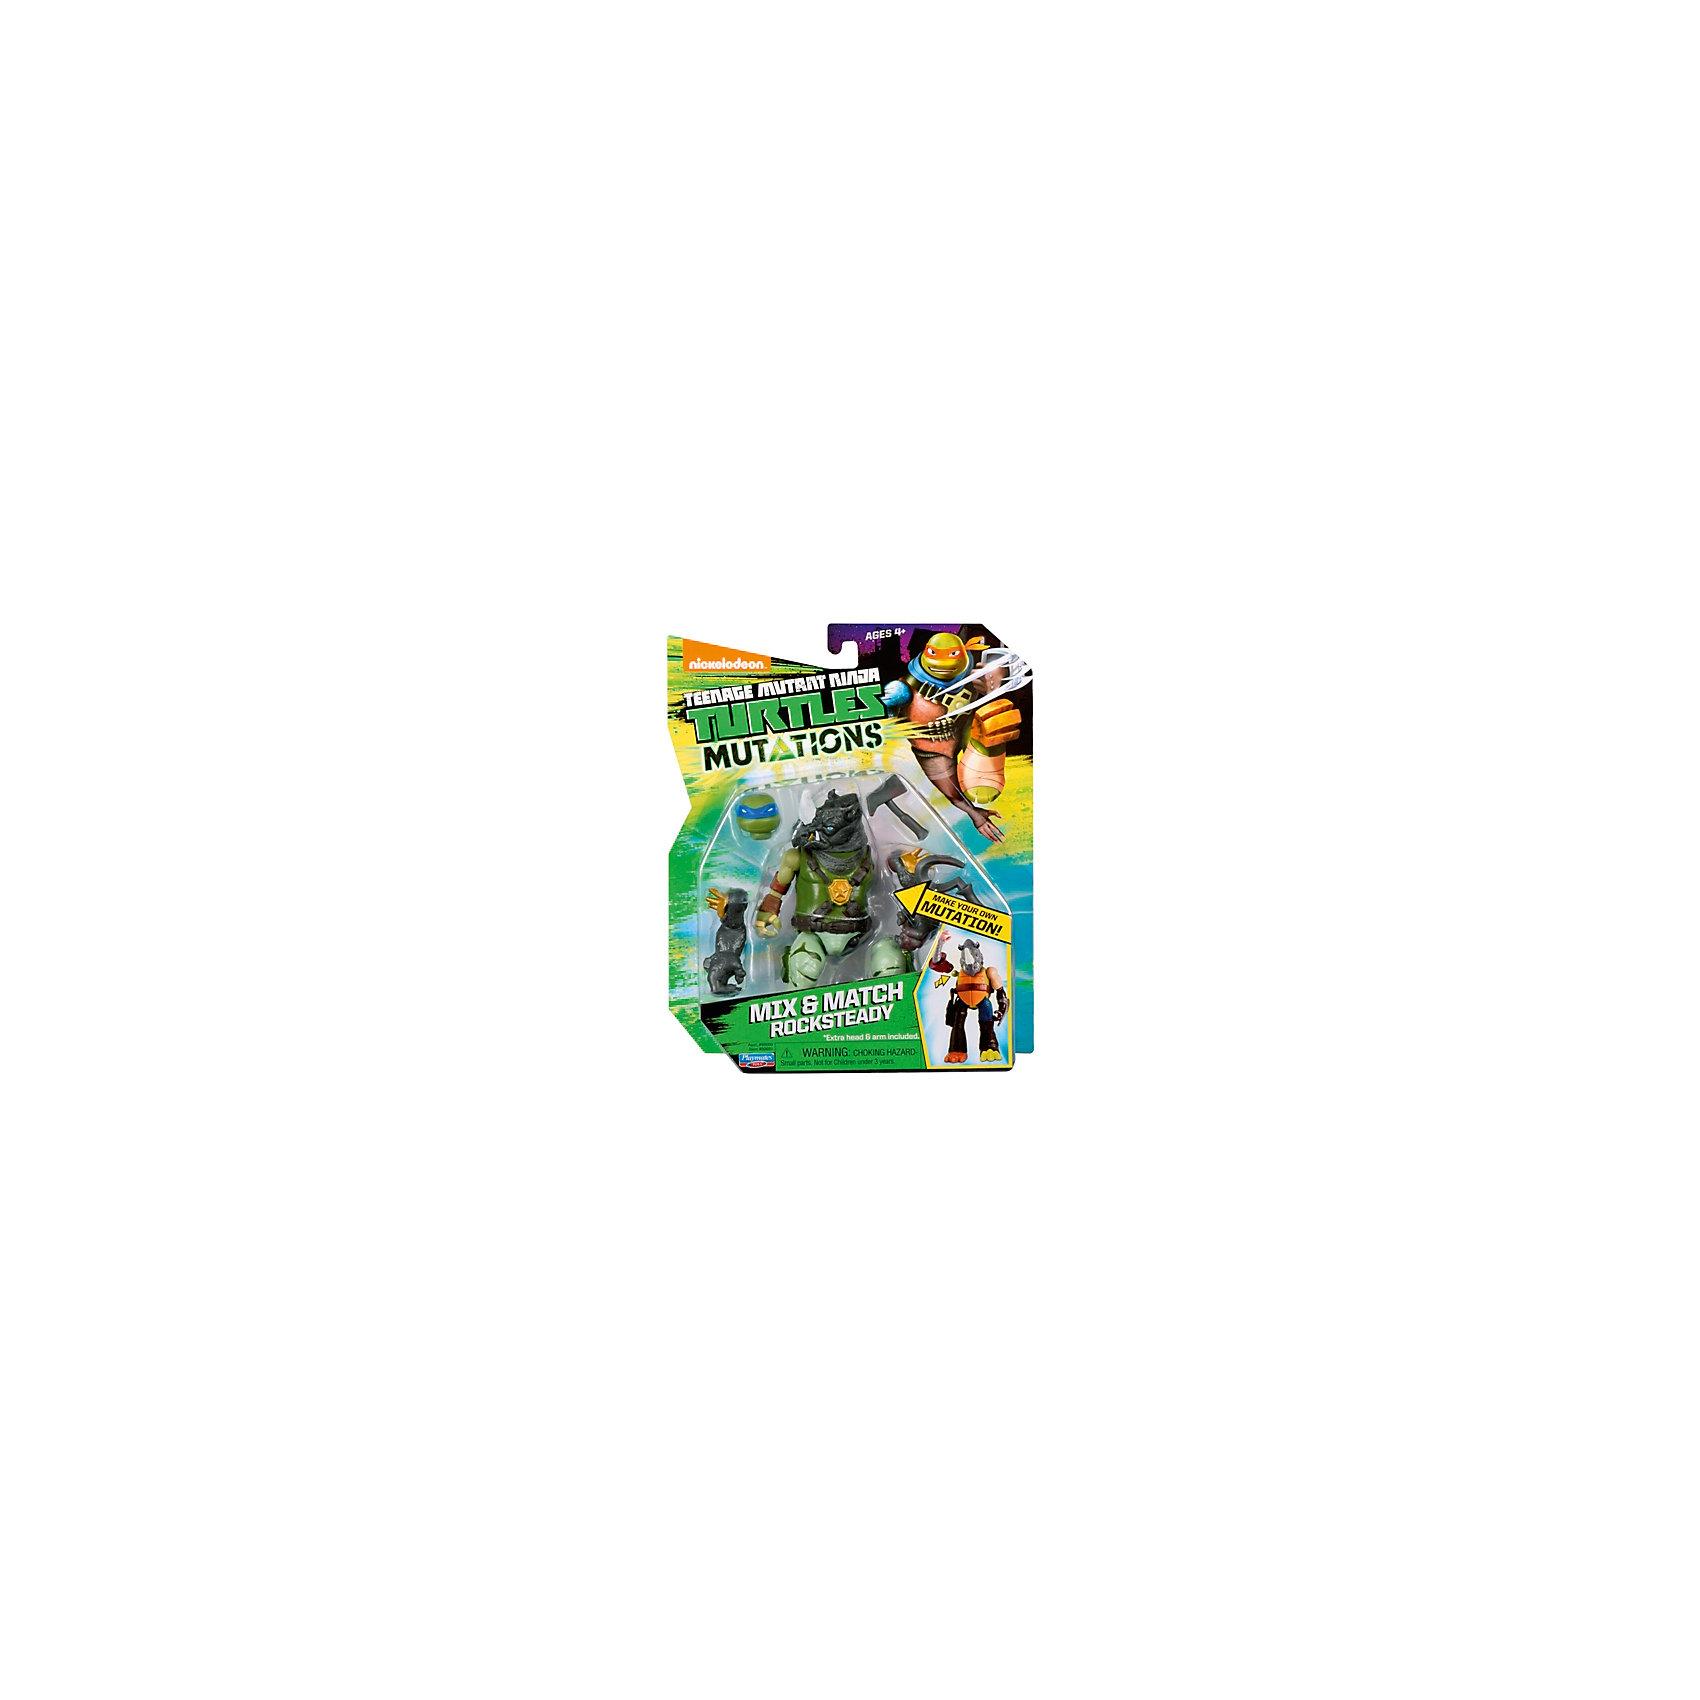 - Фигурка Рокстеди, 12 см, Черепашки Ниндзя трицикл с фигуркой черепашки ниндзя